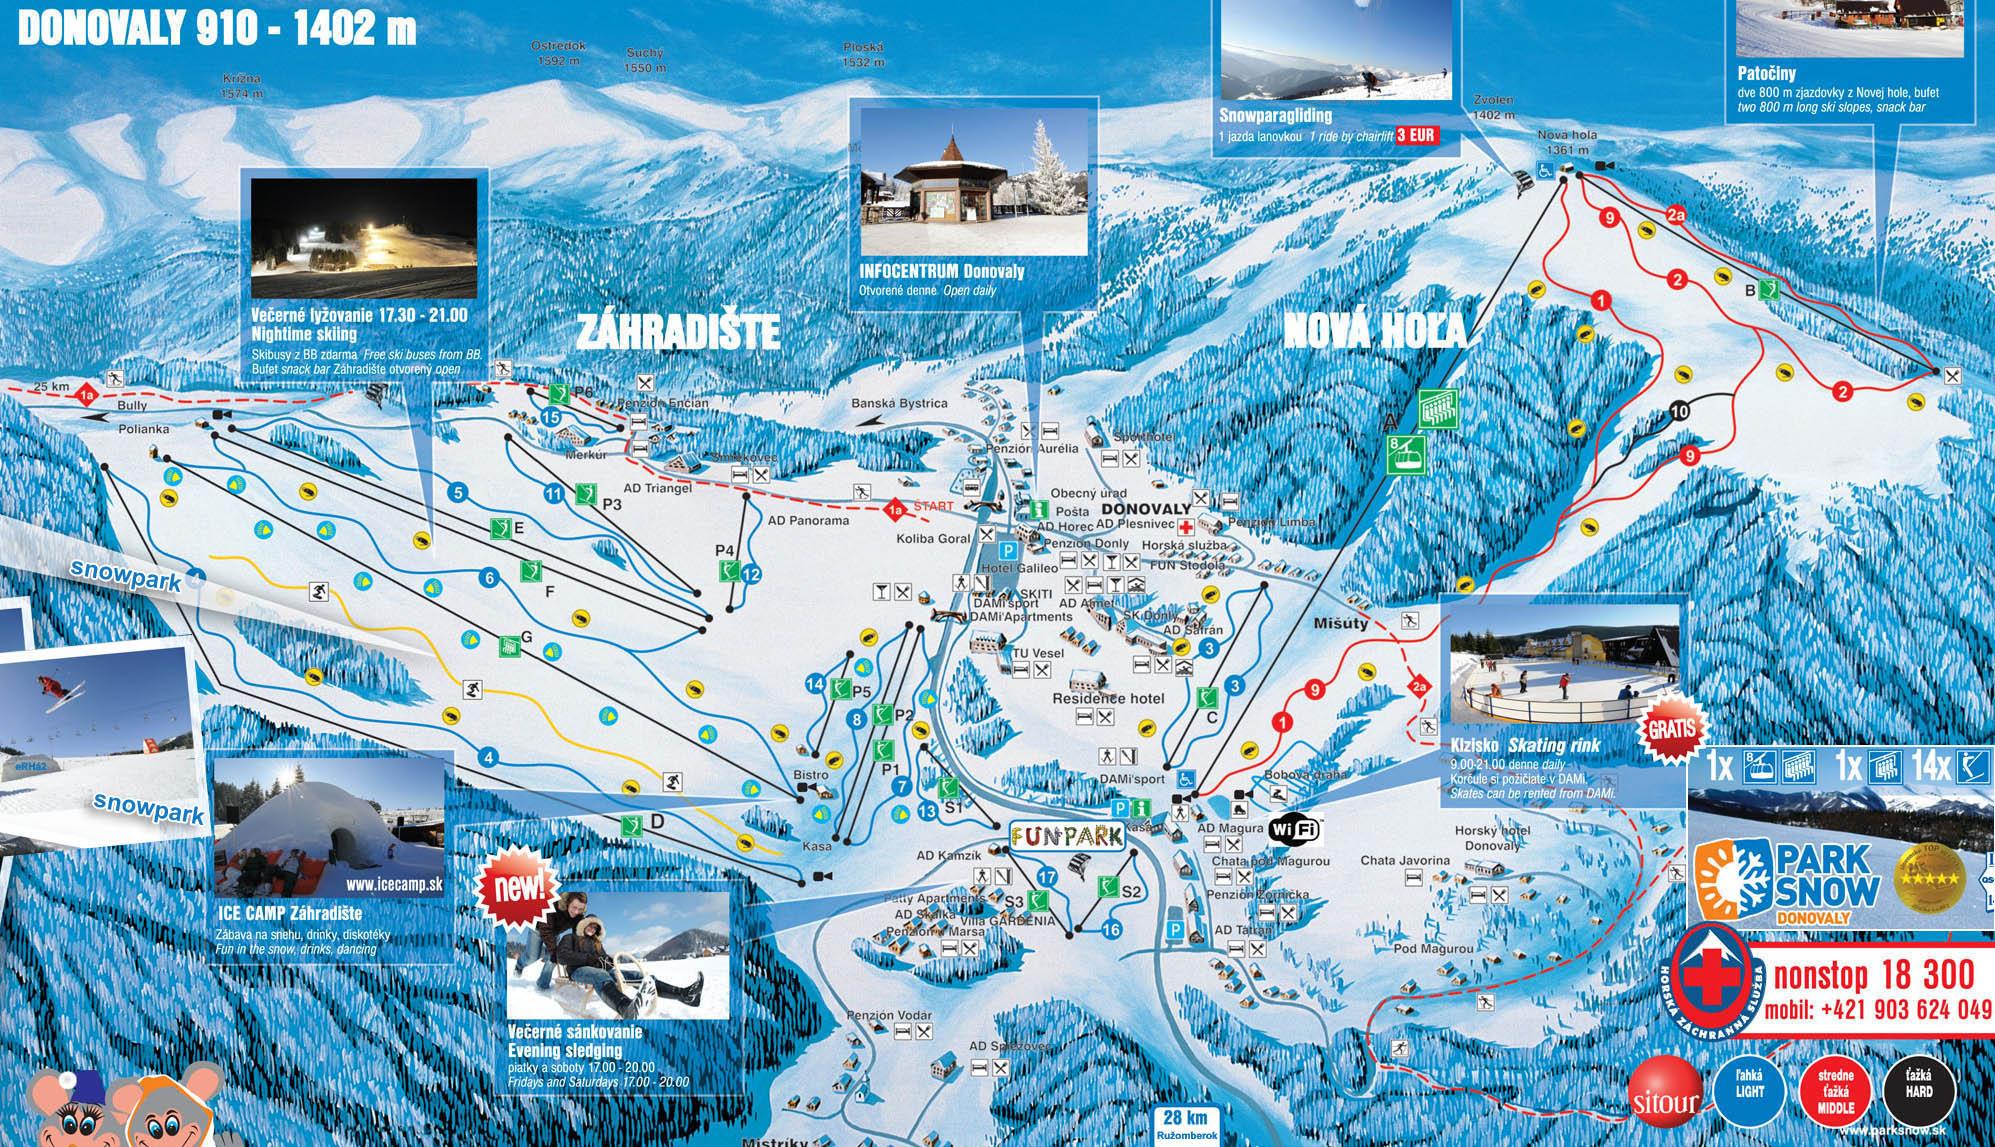 Donovaly Slovakia Skiing Slovakia Best Slovak Ski